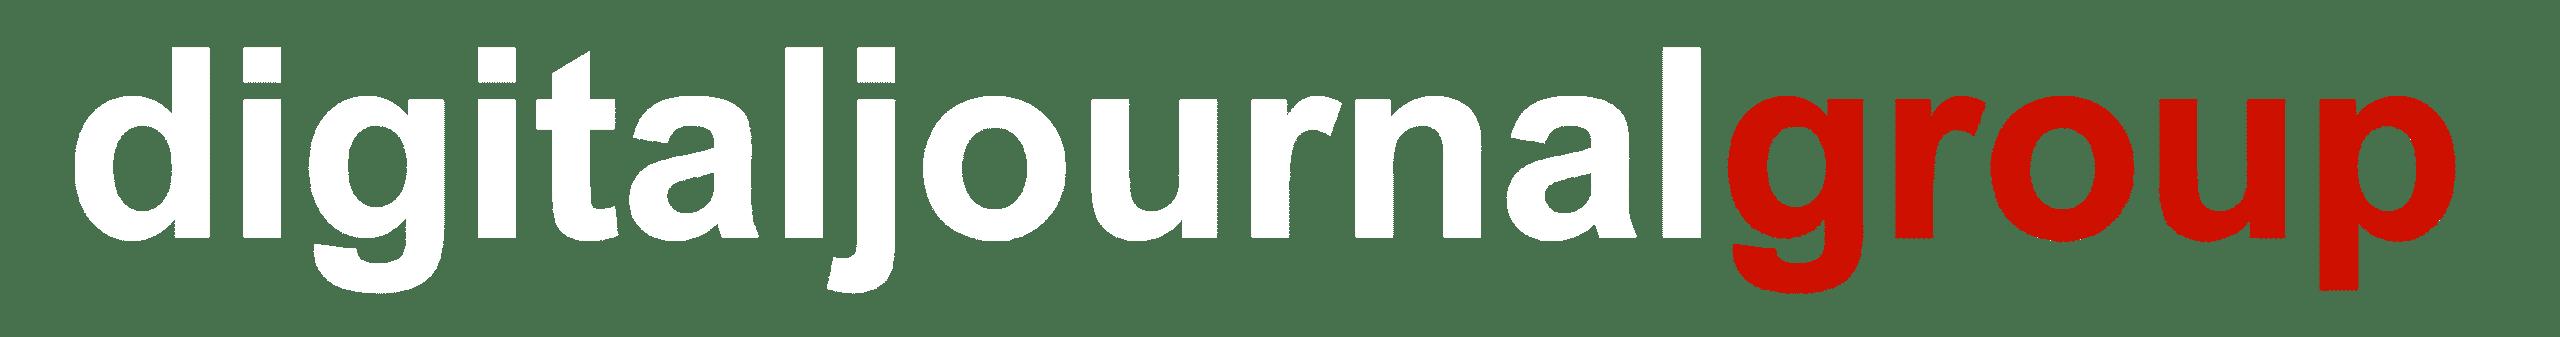 Digital Journal Group